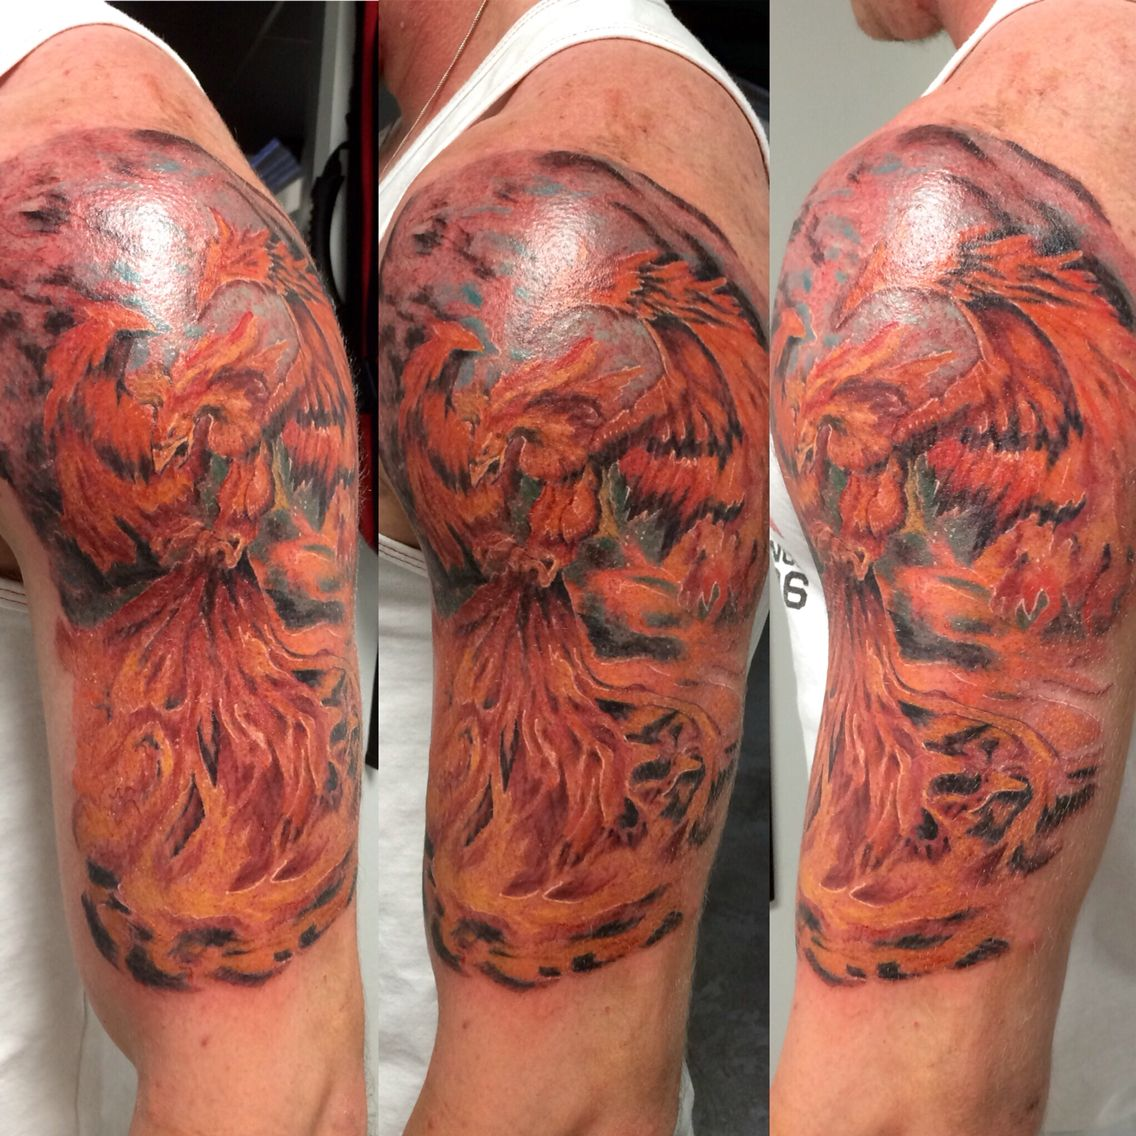 100 Tattoo Shops In Odessa Tx Golden Rose Tattoo 12 Photos Tattoo 1128 Bandera Rd San A